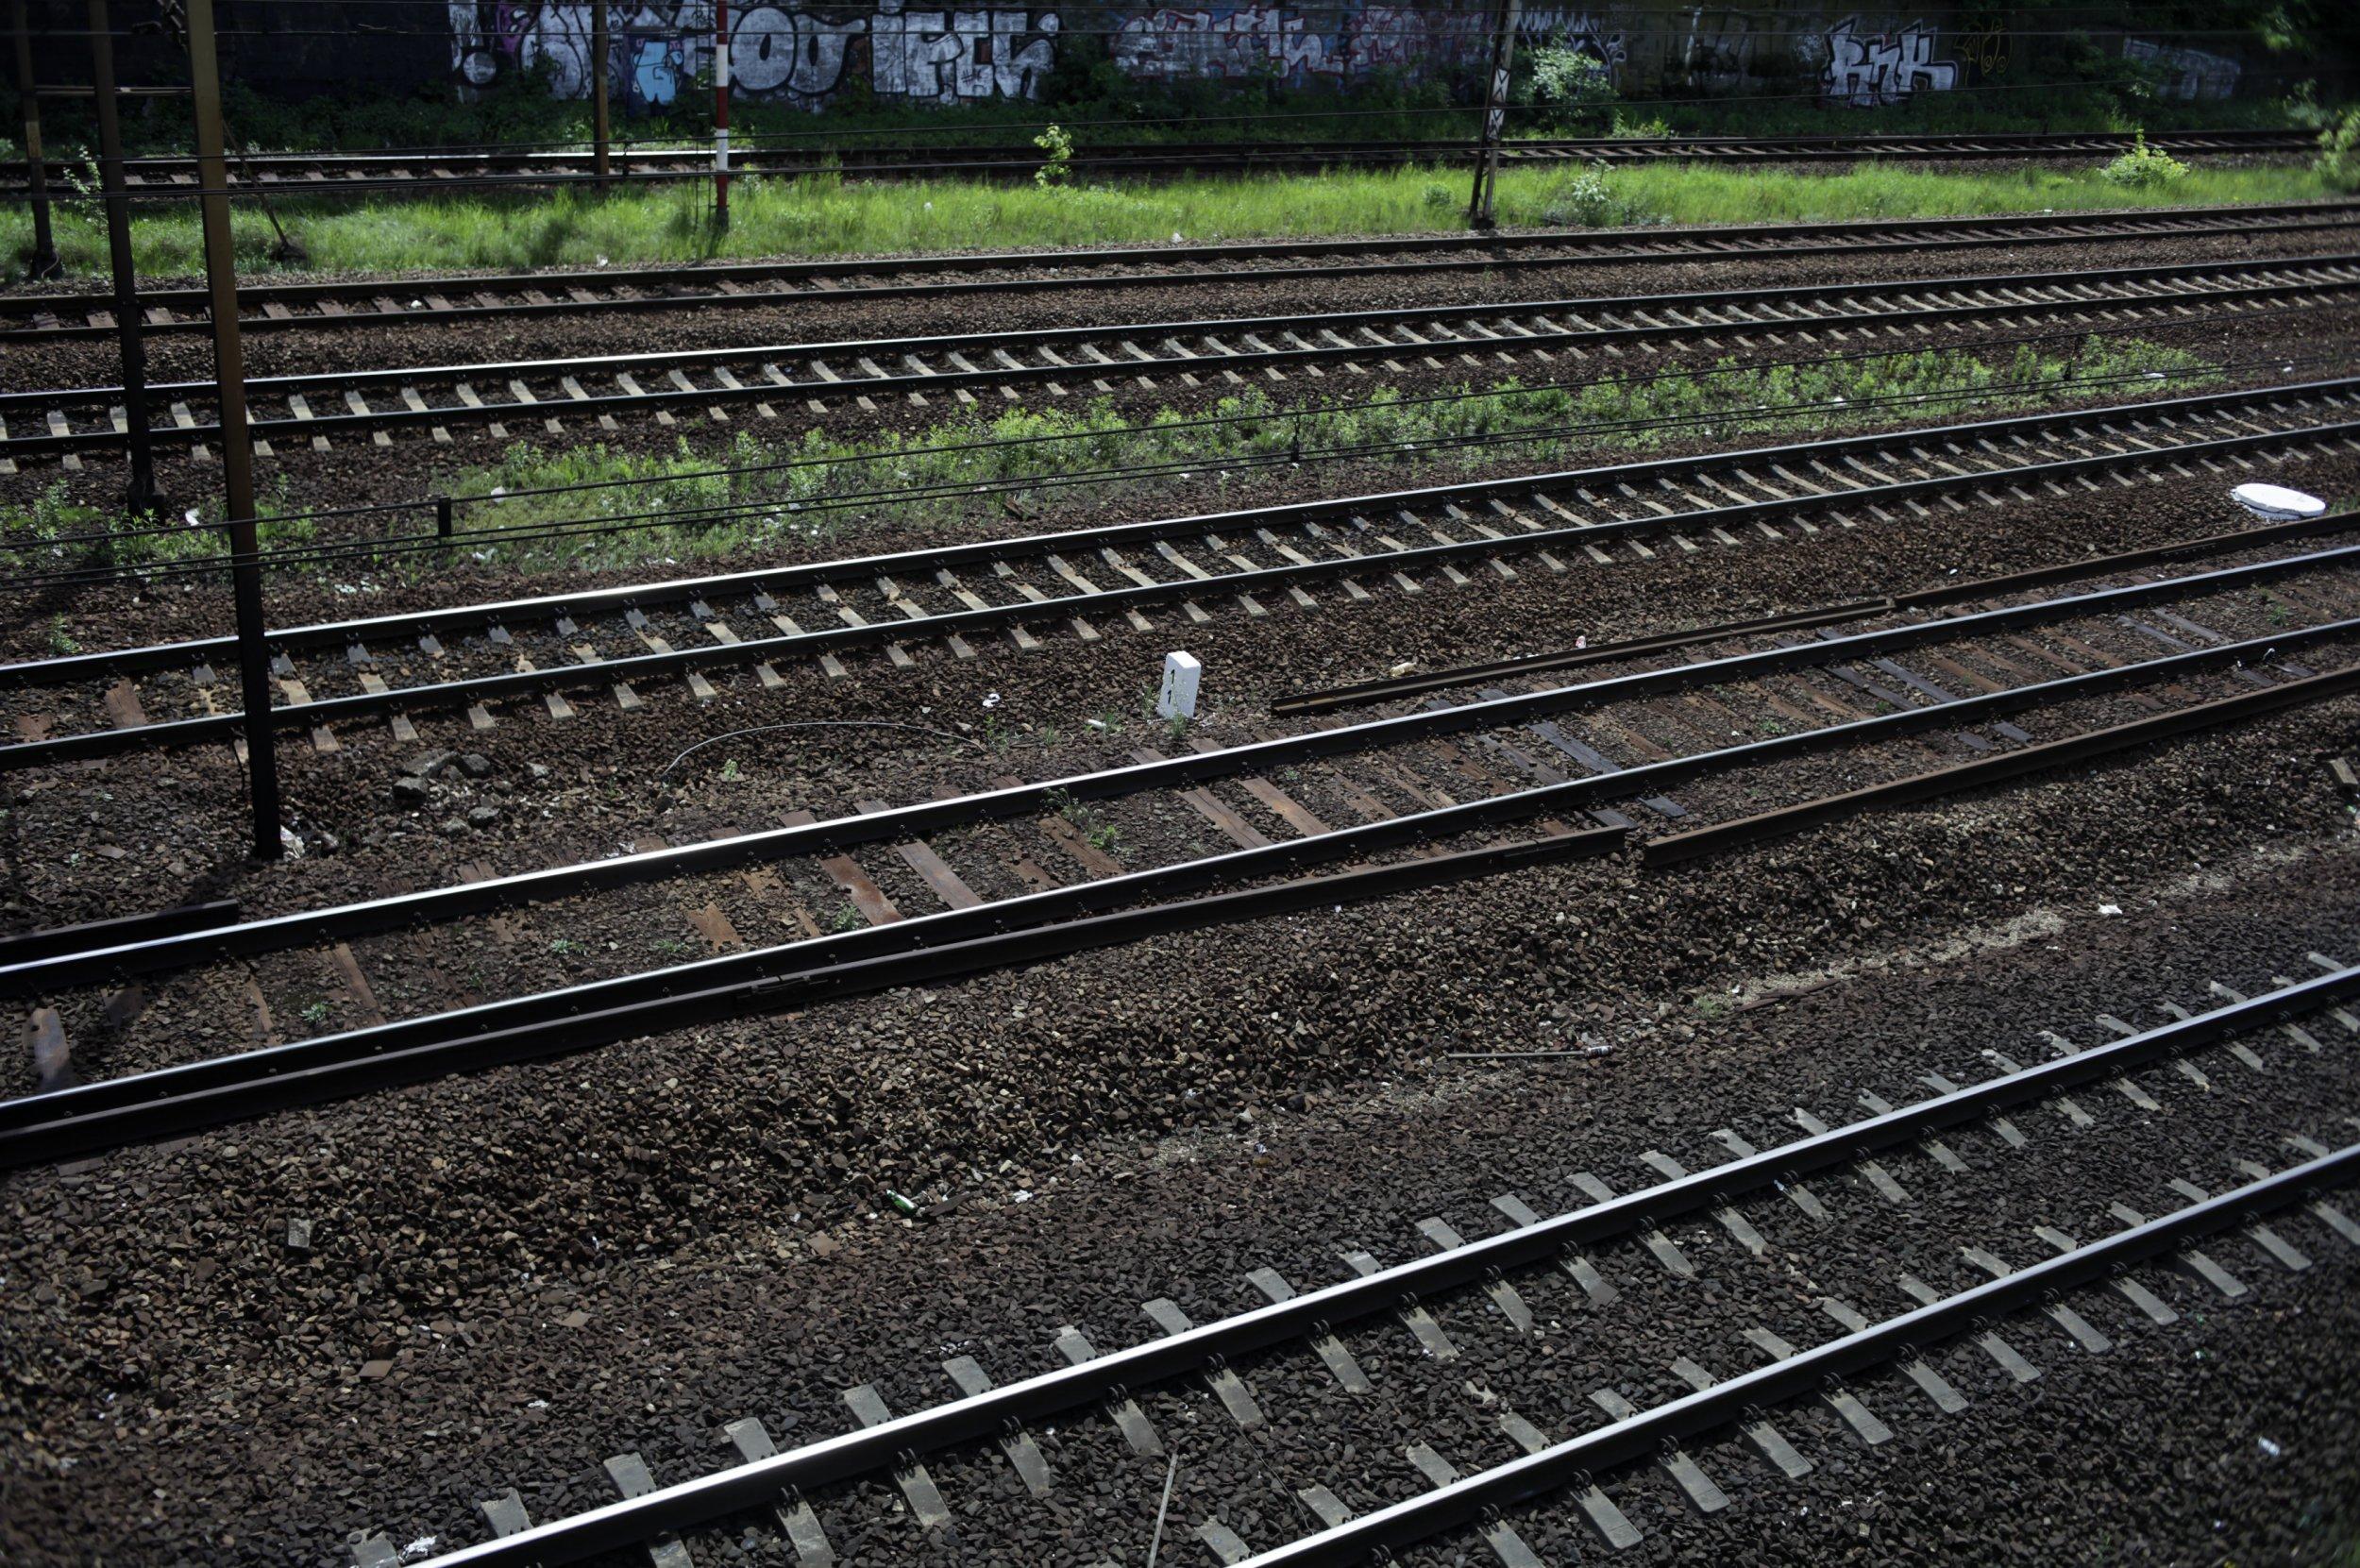 08_27_PolandTrain_02